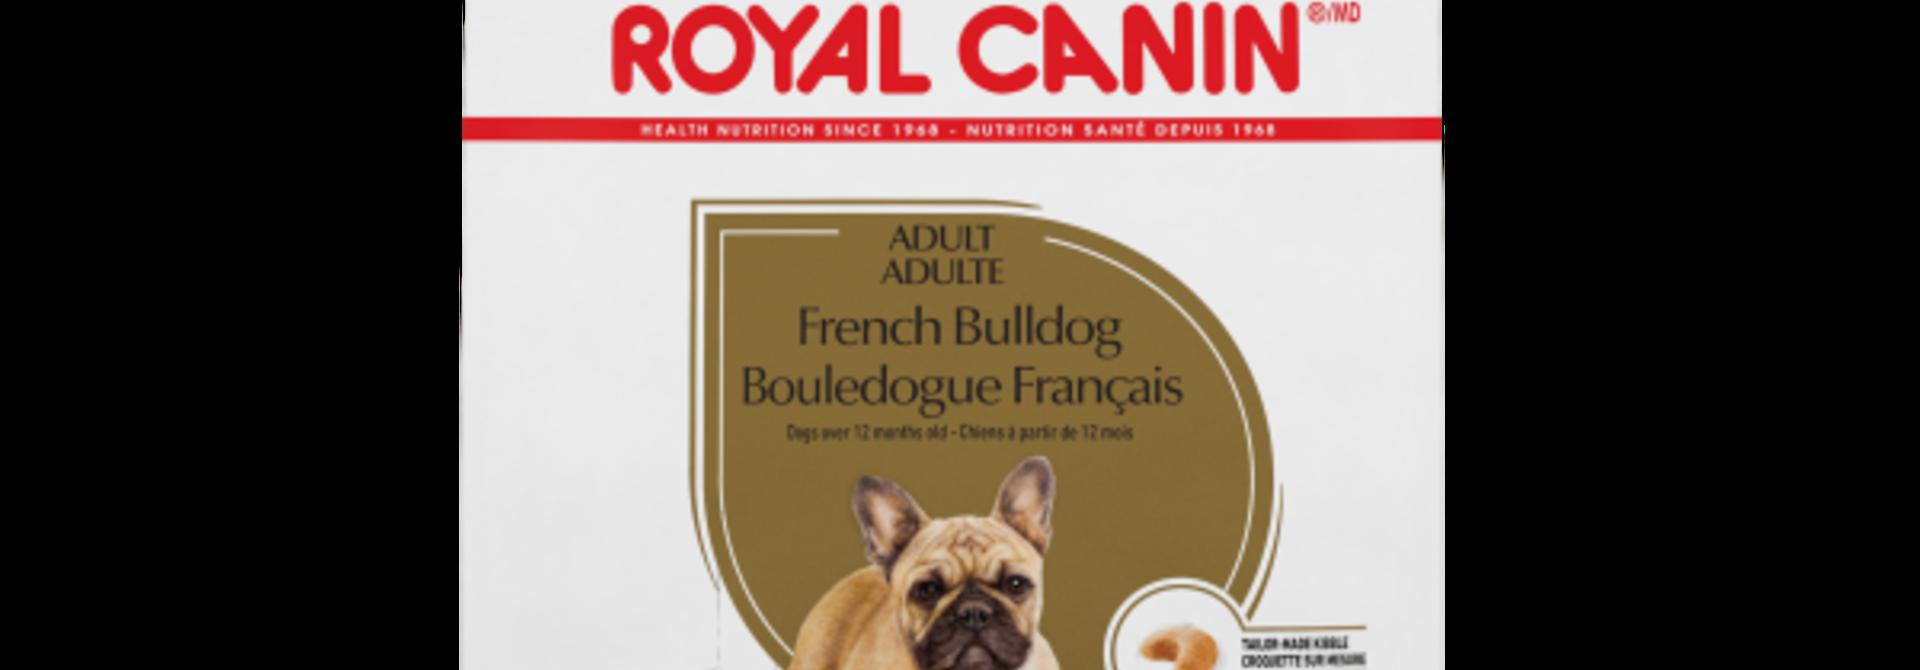 Royal Canin French Bulldog 6lb